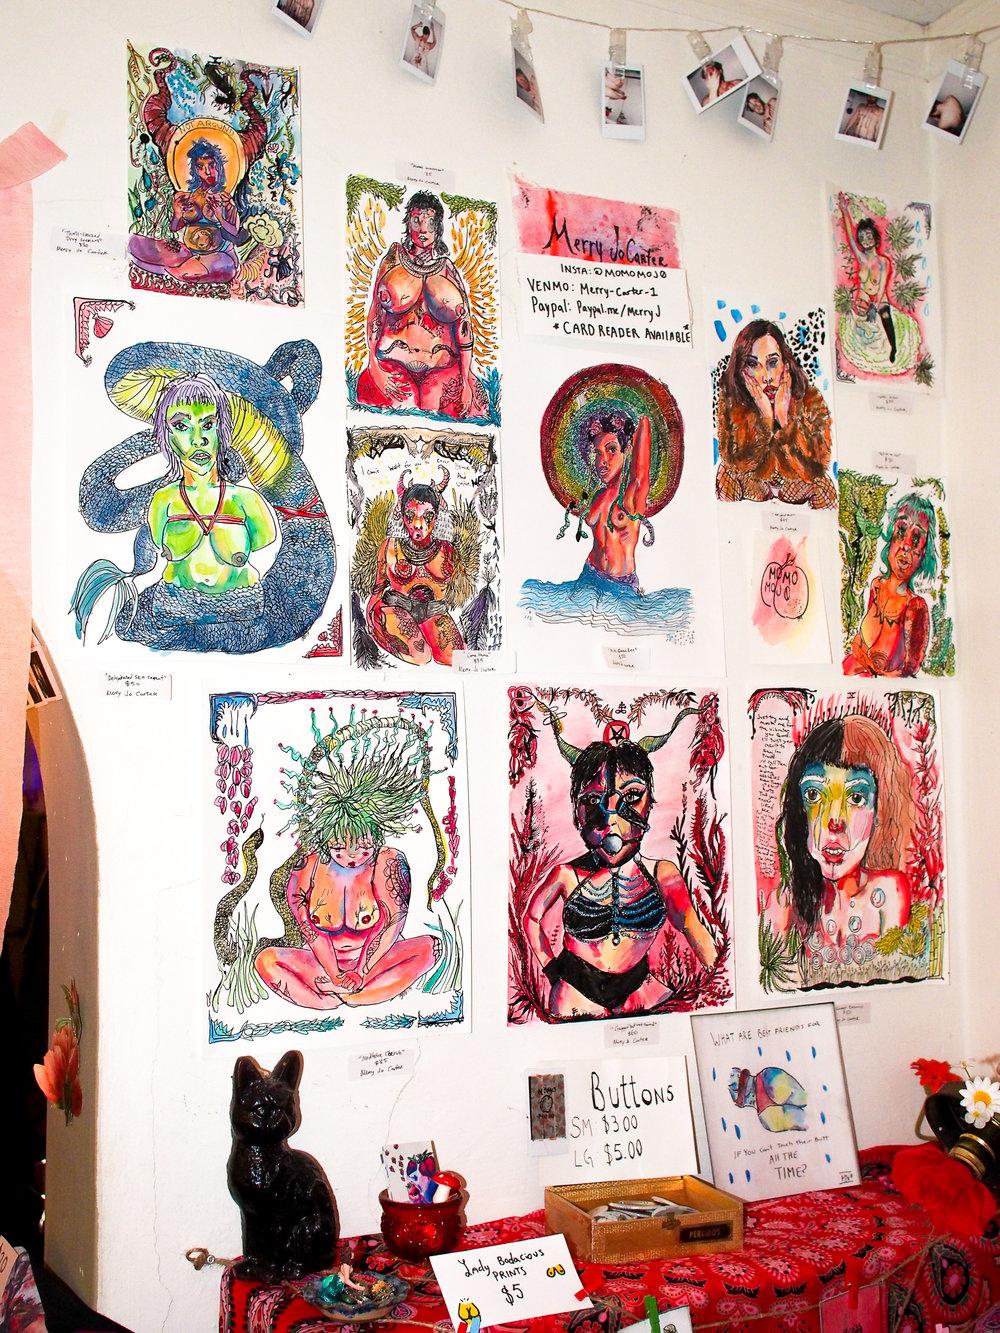 Cat Castle c0-curator Mary Jo Carter's decadent artwork (@momomoj0)